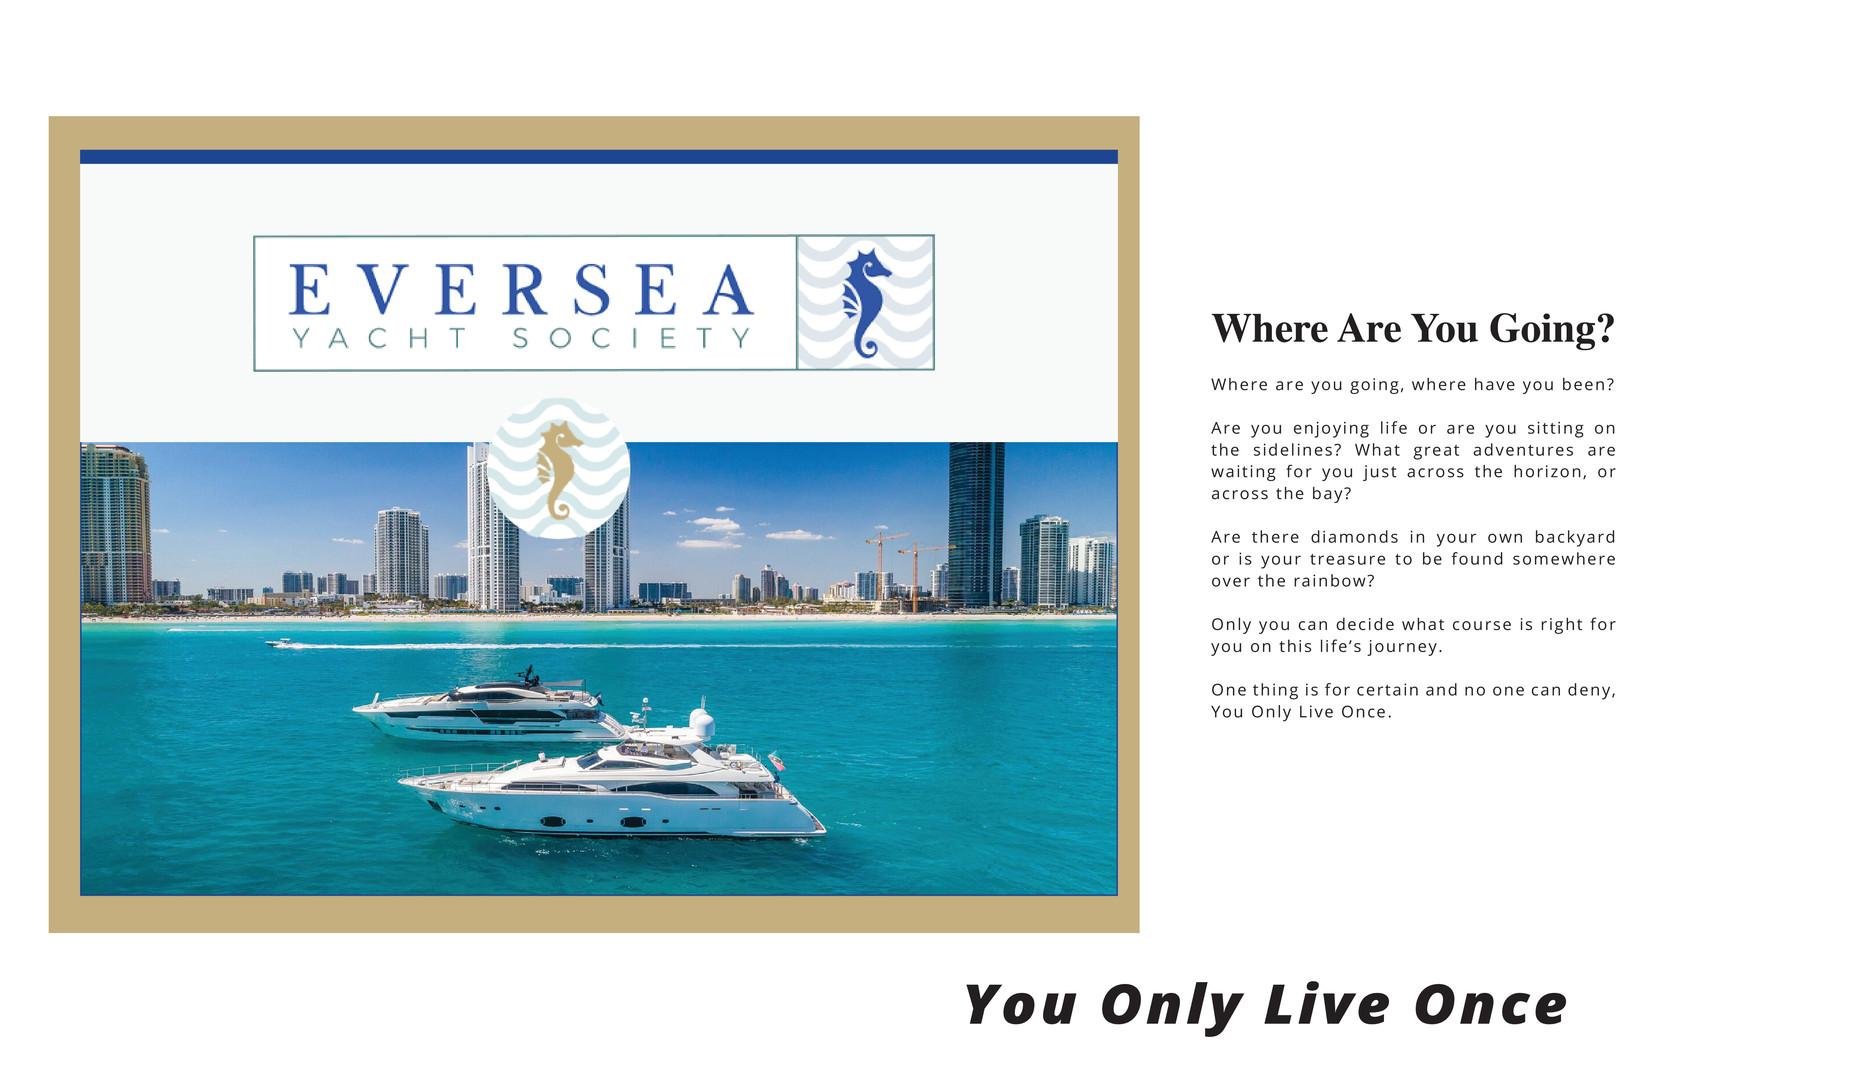 Eversea Page 9 #.jpg